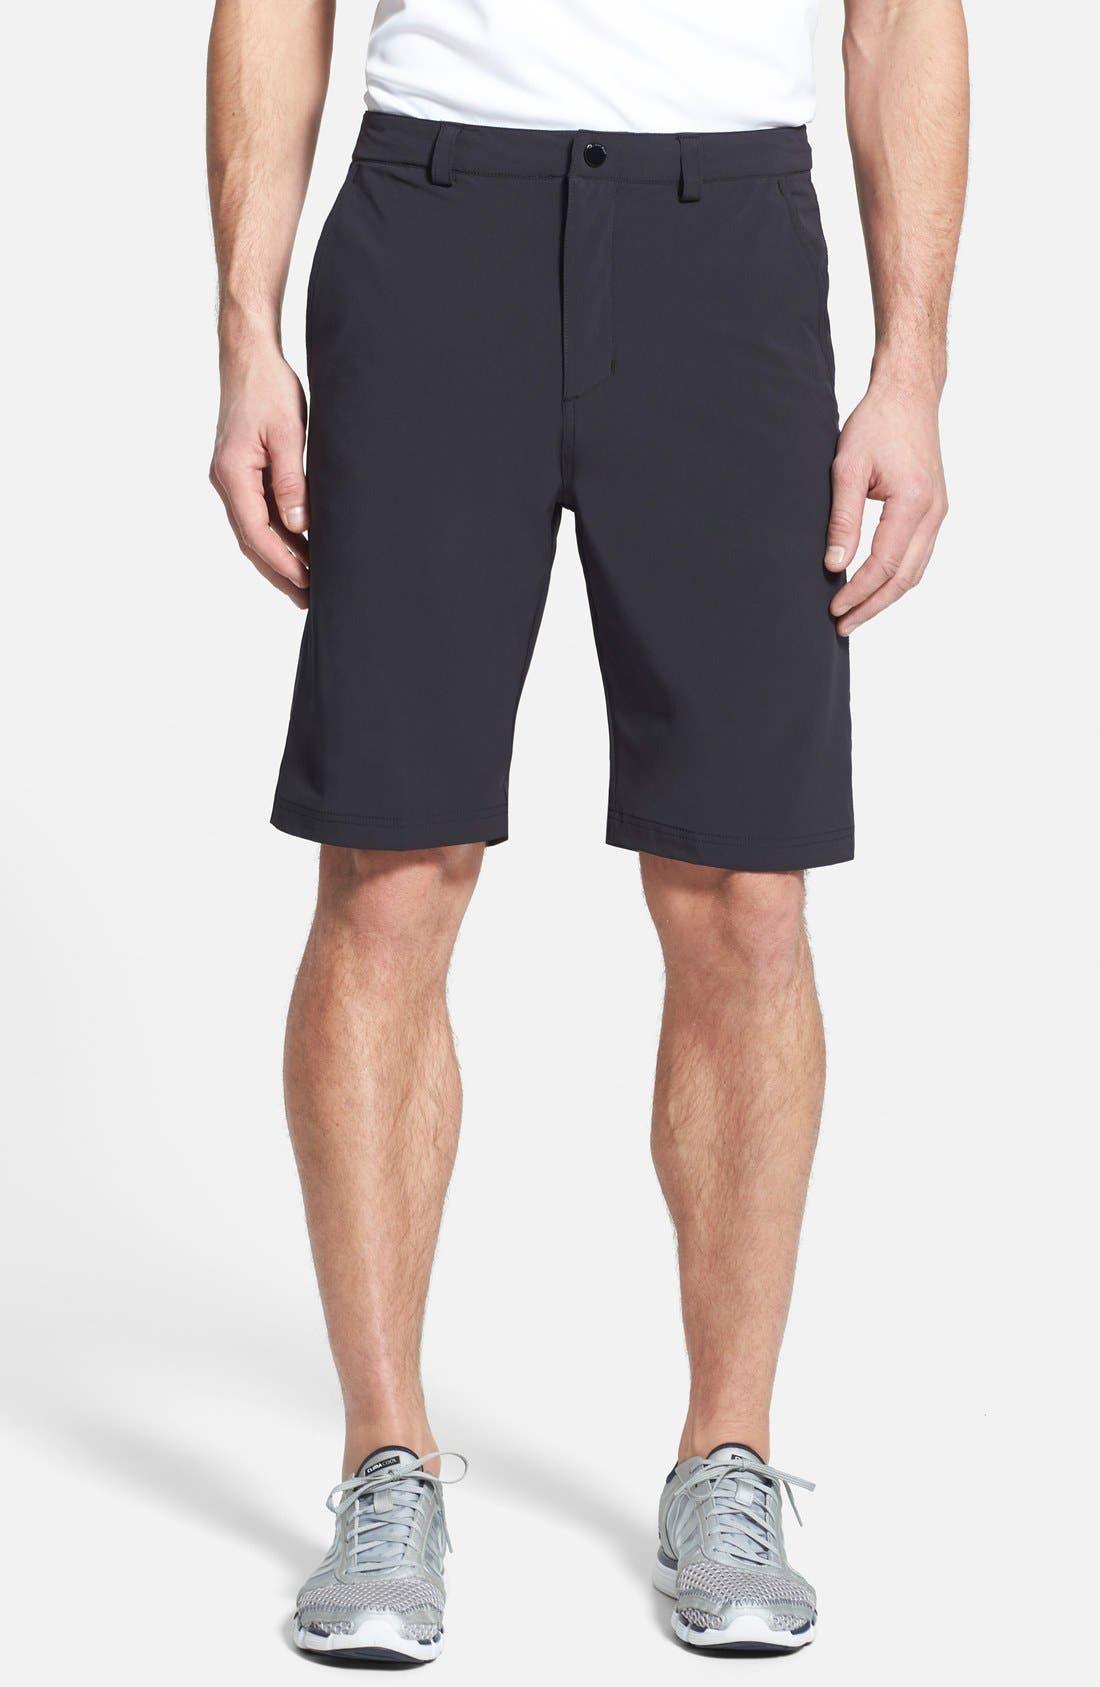 'HP QD Classic' Quick Dry Shorts,                             Main thumbnail 1, color,                             001